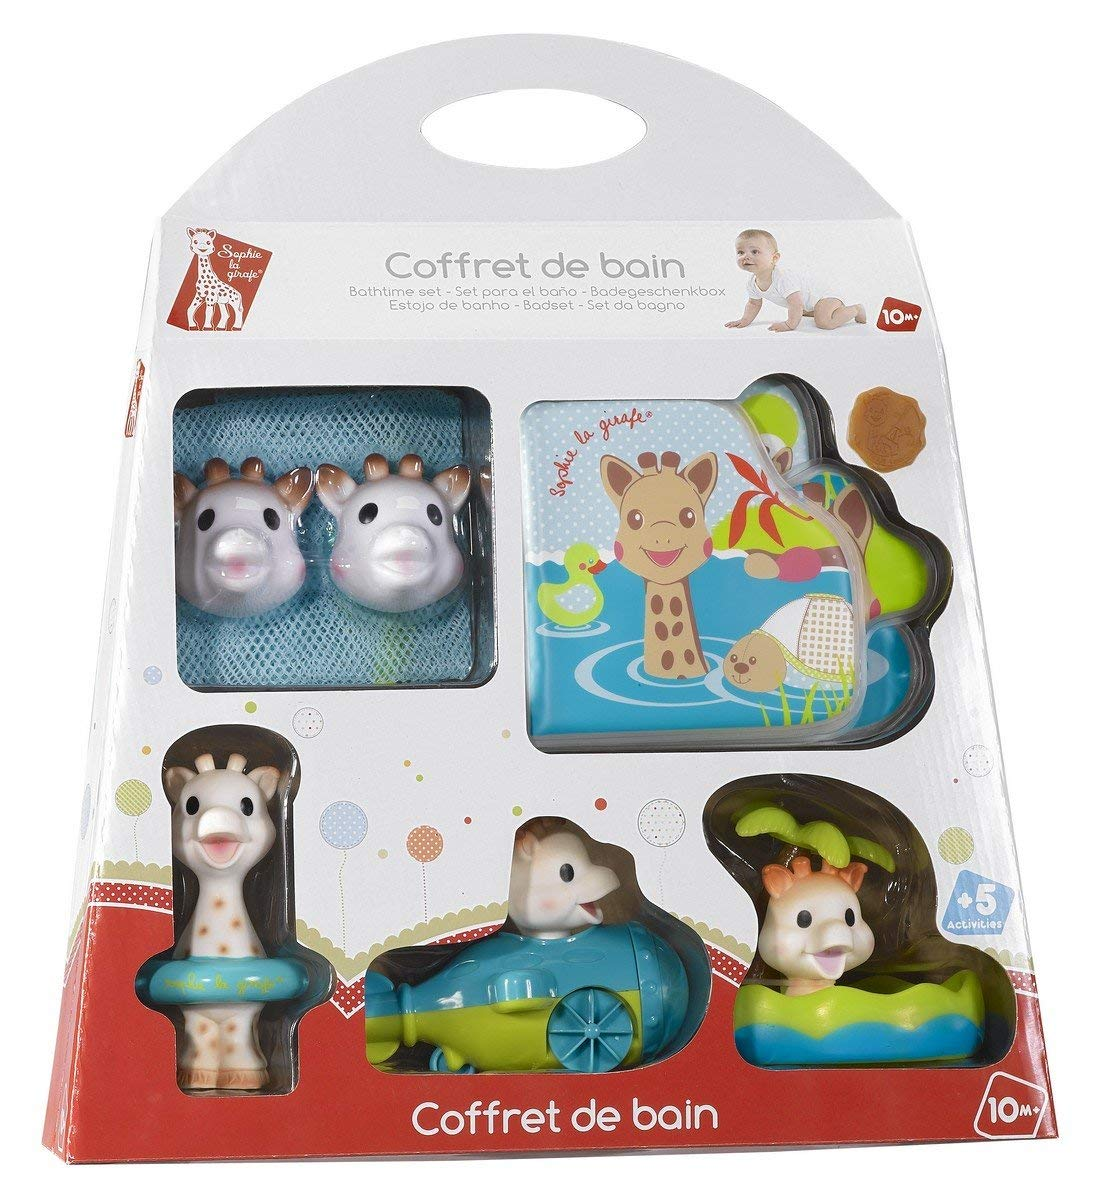 jouet bain sophie la girafe